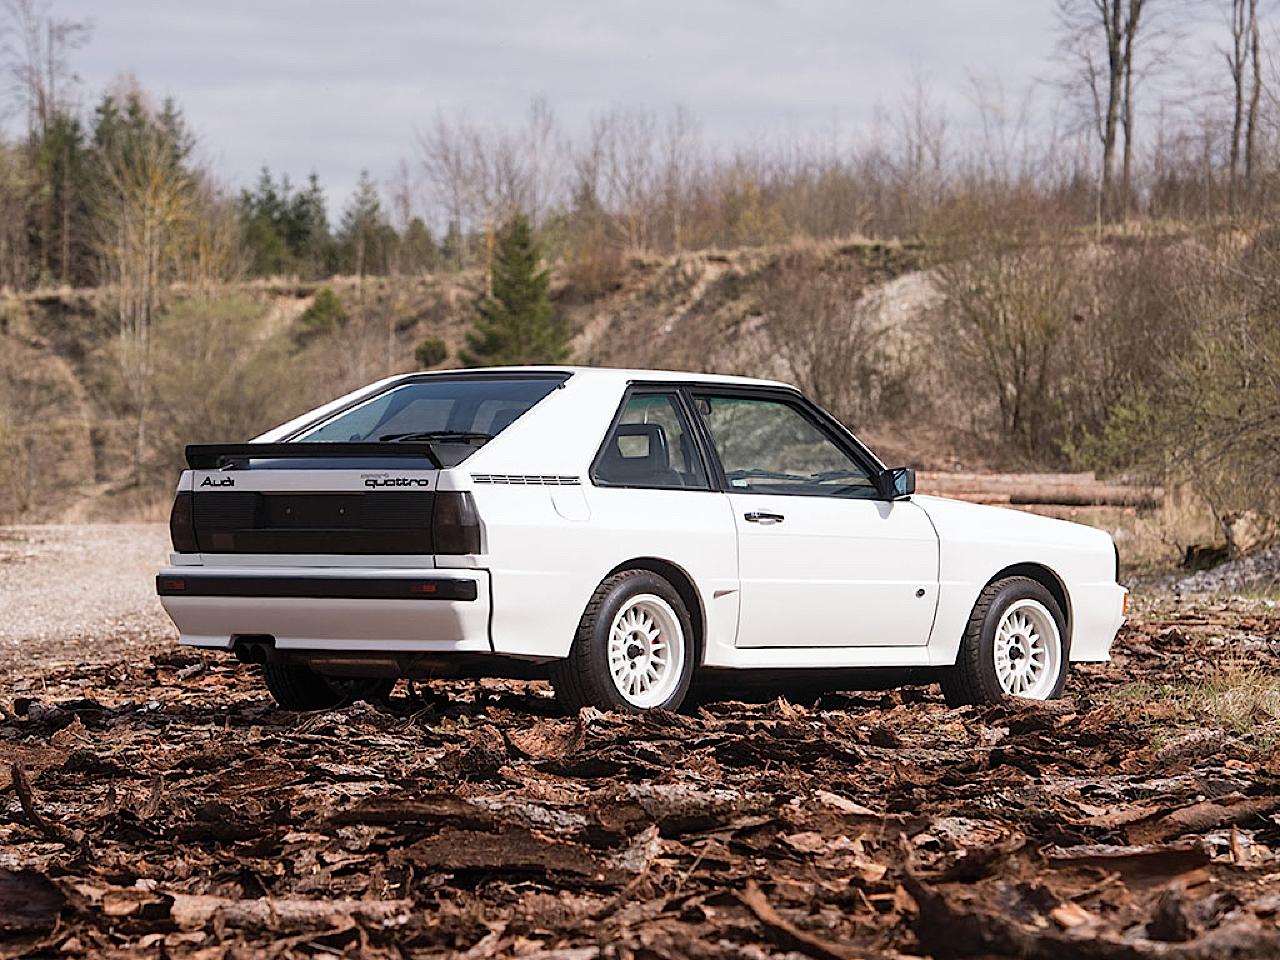 Audi Quattro Sport - Châssis court, turbo et muscu ! 32